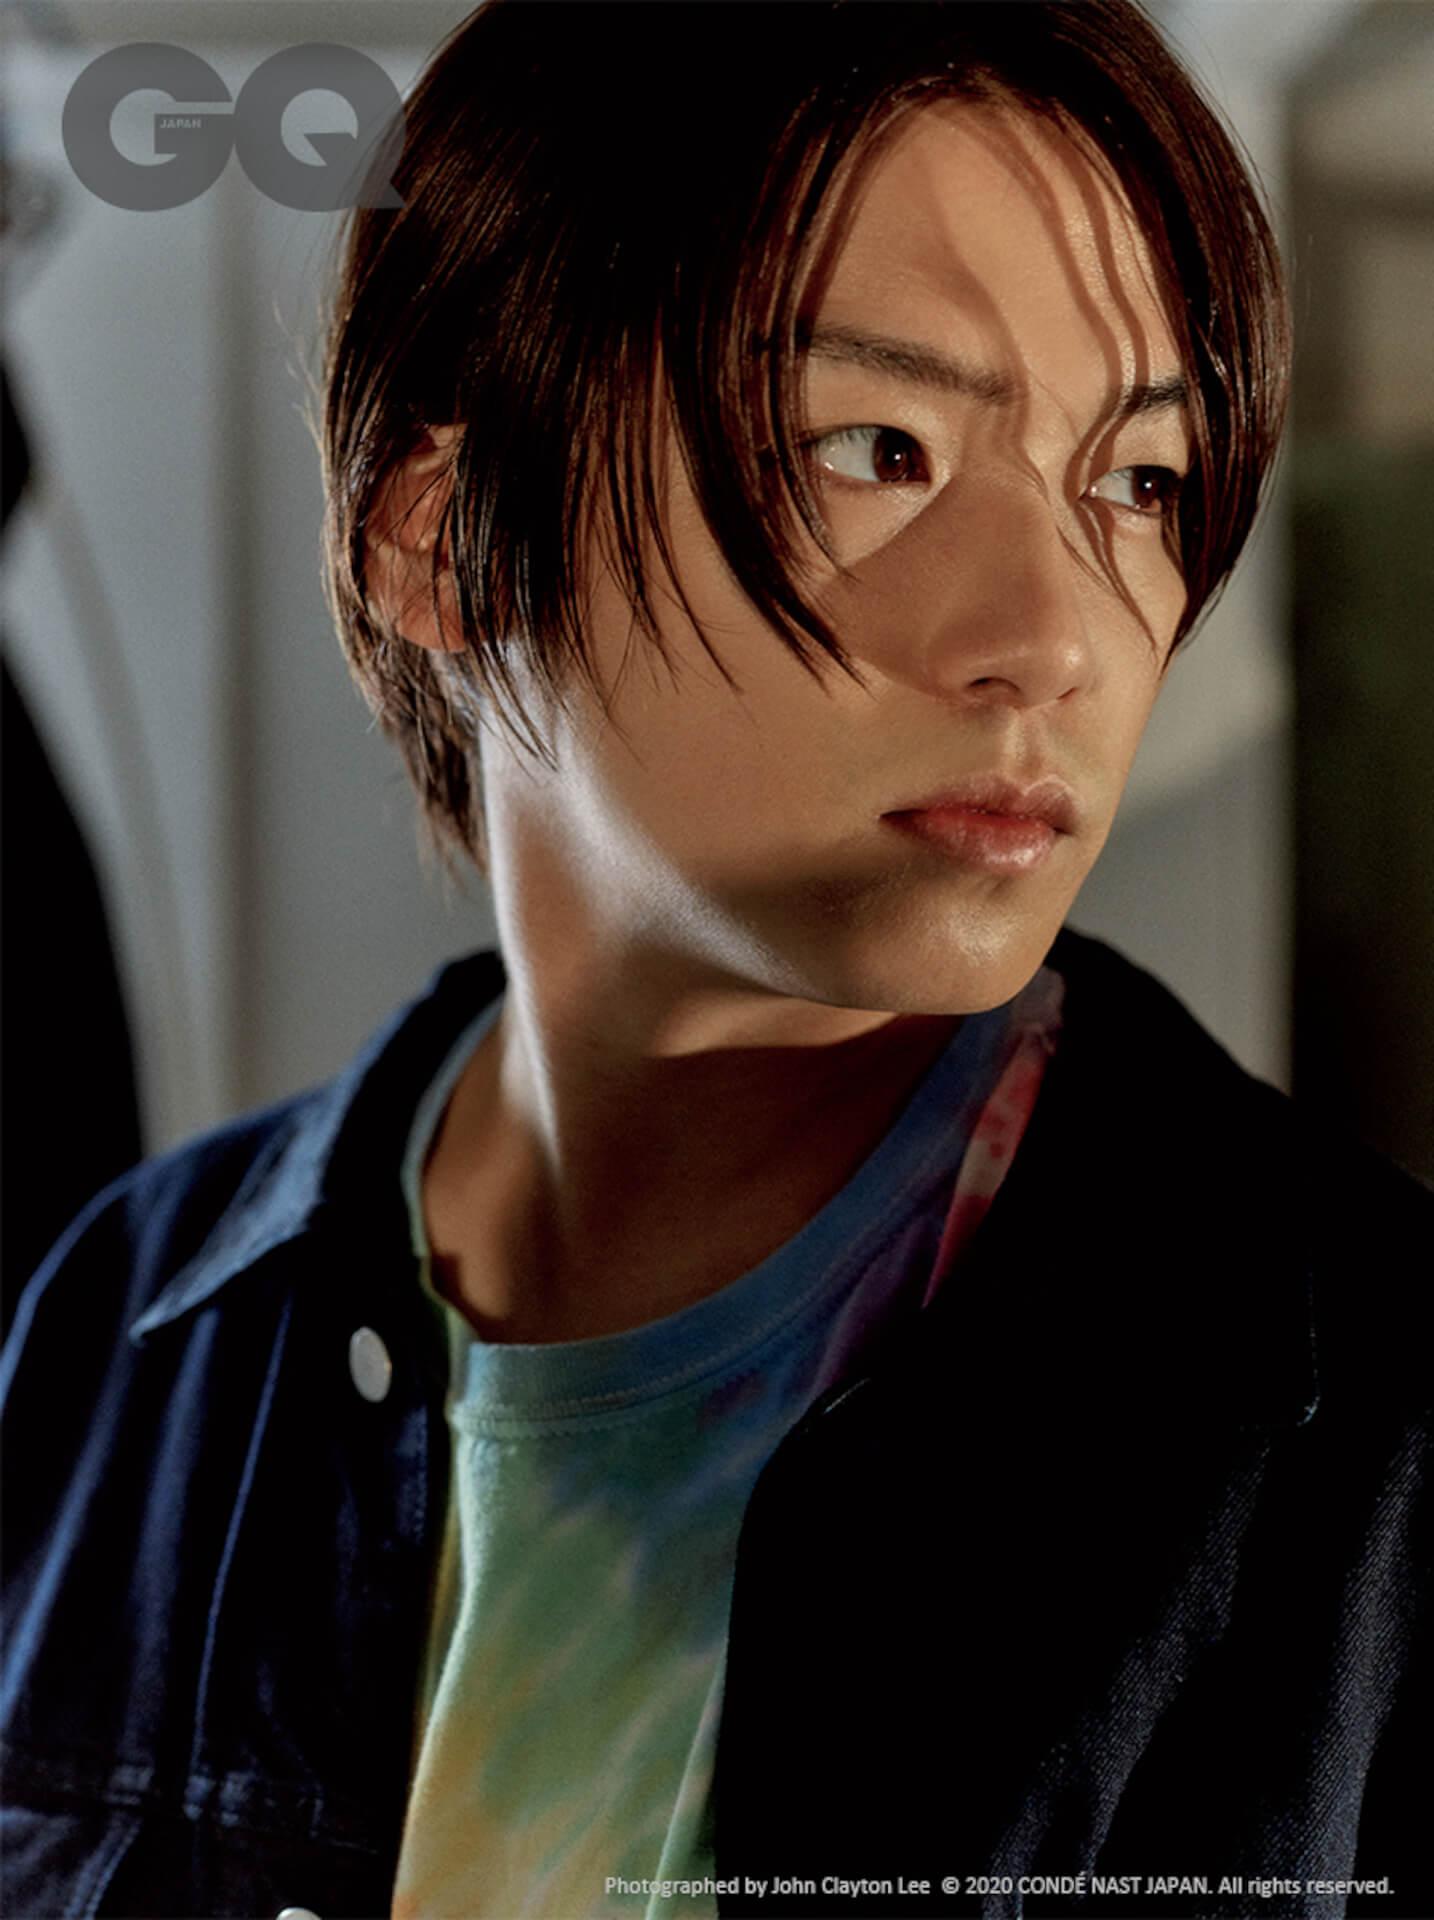 BADHOP『GQ JAPAN』4月号表紙に登場 Hey! Say! JUMP髙木雄也がスタイリング初登場 ac200221_gqjapan_badhop_02